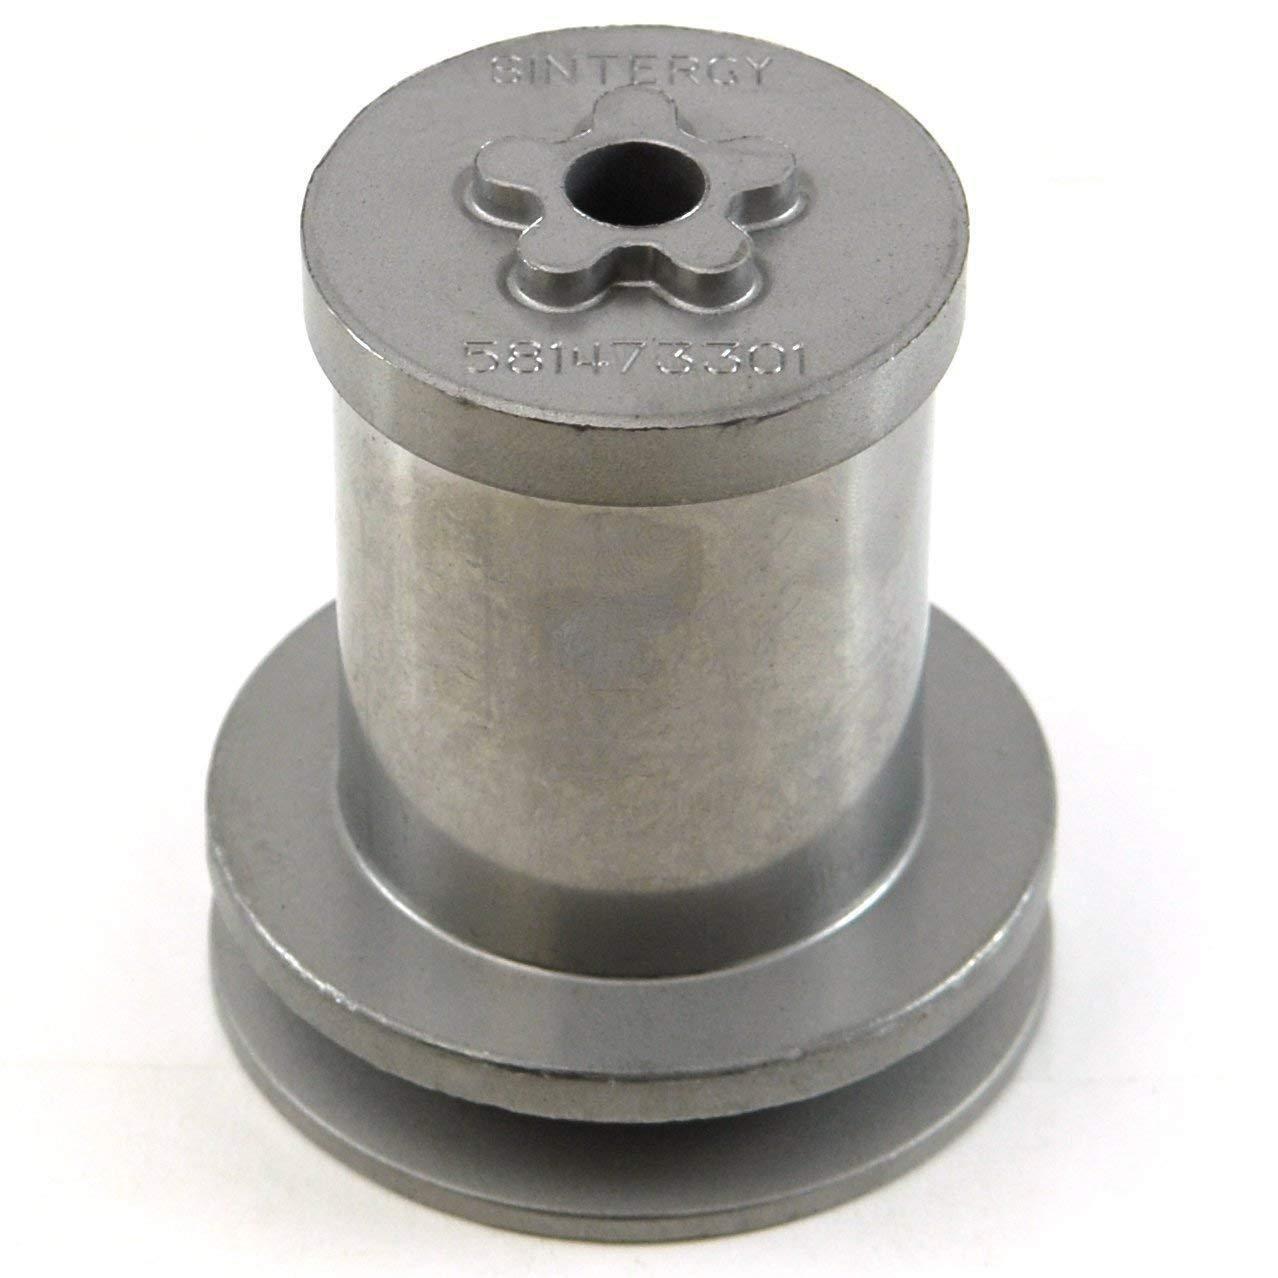 Craftsman Genuine OEM Blade Adapter 421782, 581473301 532421782 & fits Poulan Husqvarna